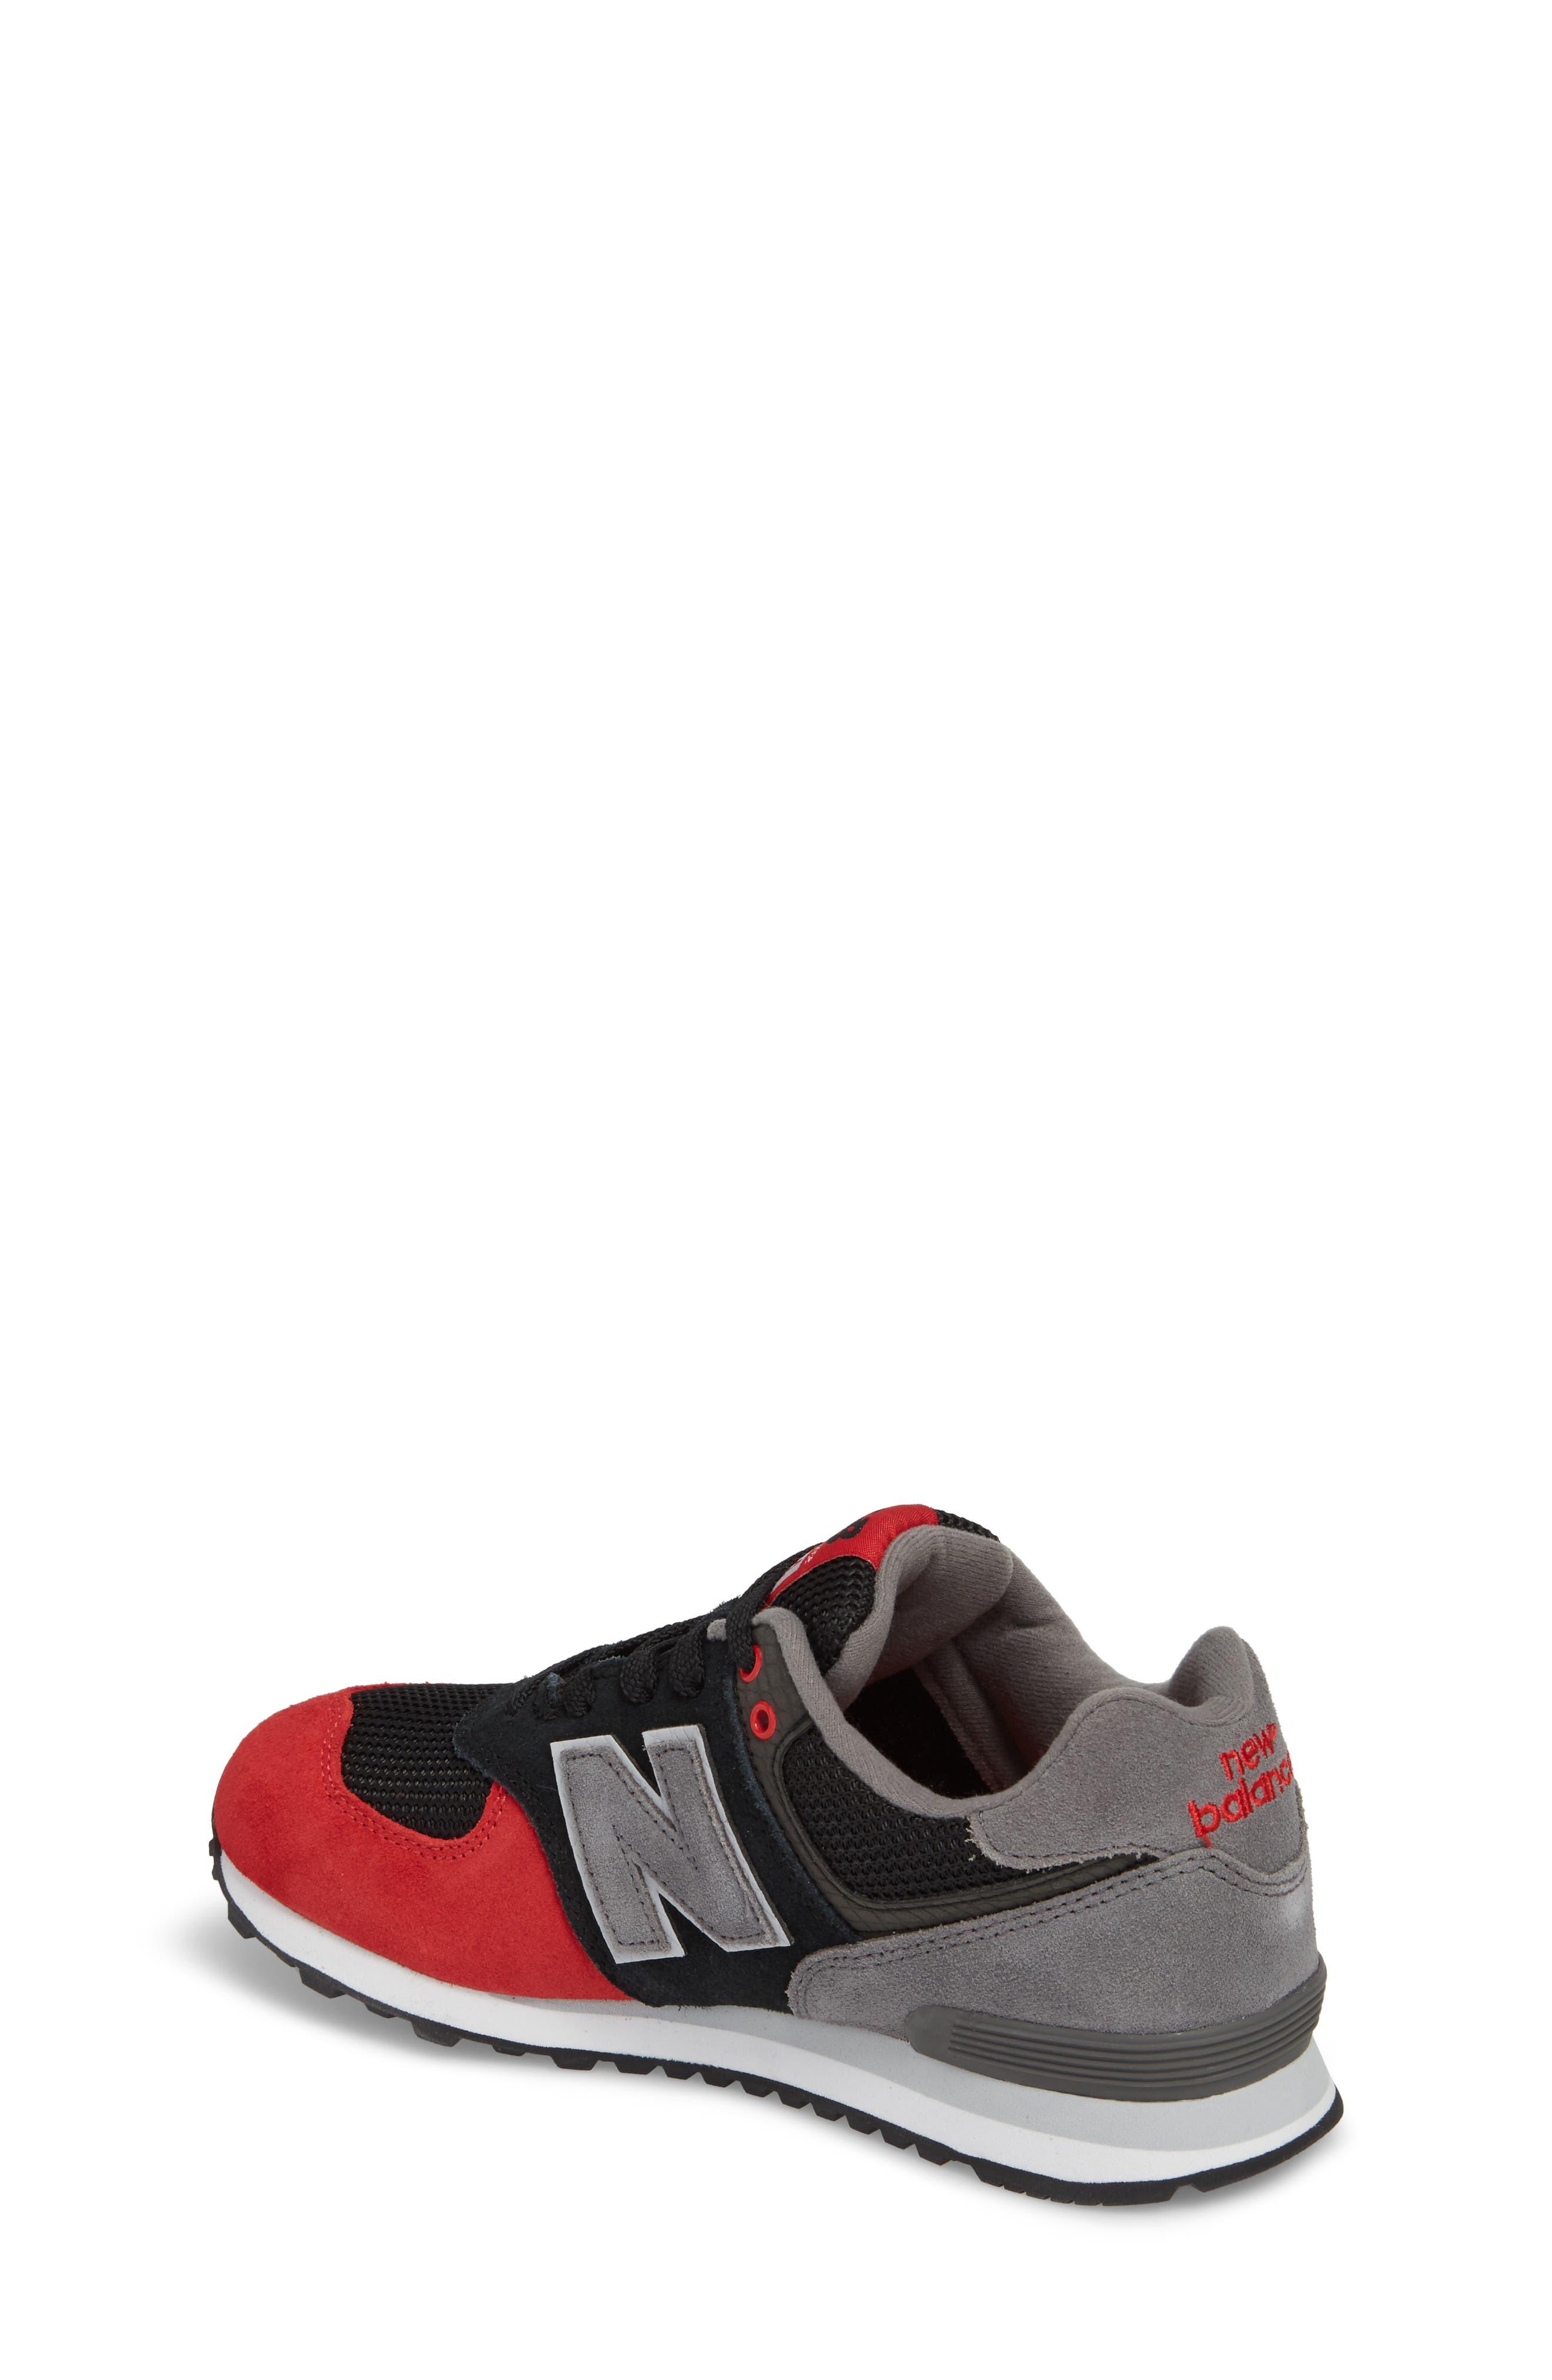 574 Serpent Luxe Sneaker,                             Alternate thumbnail 3, color,